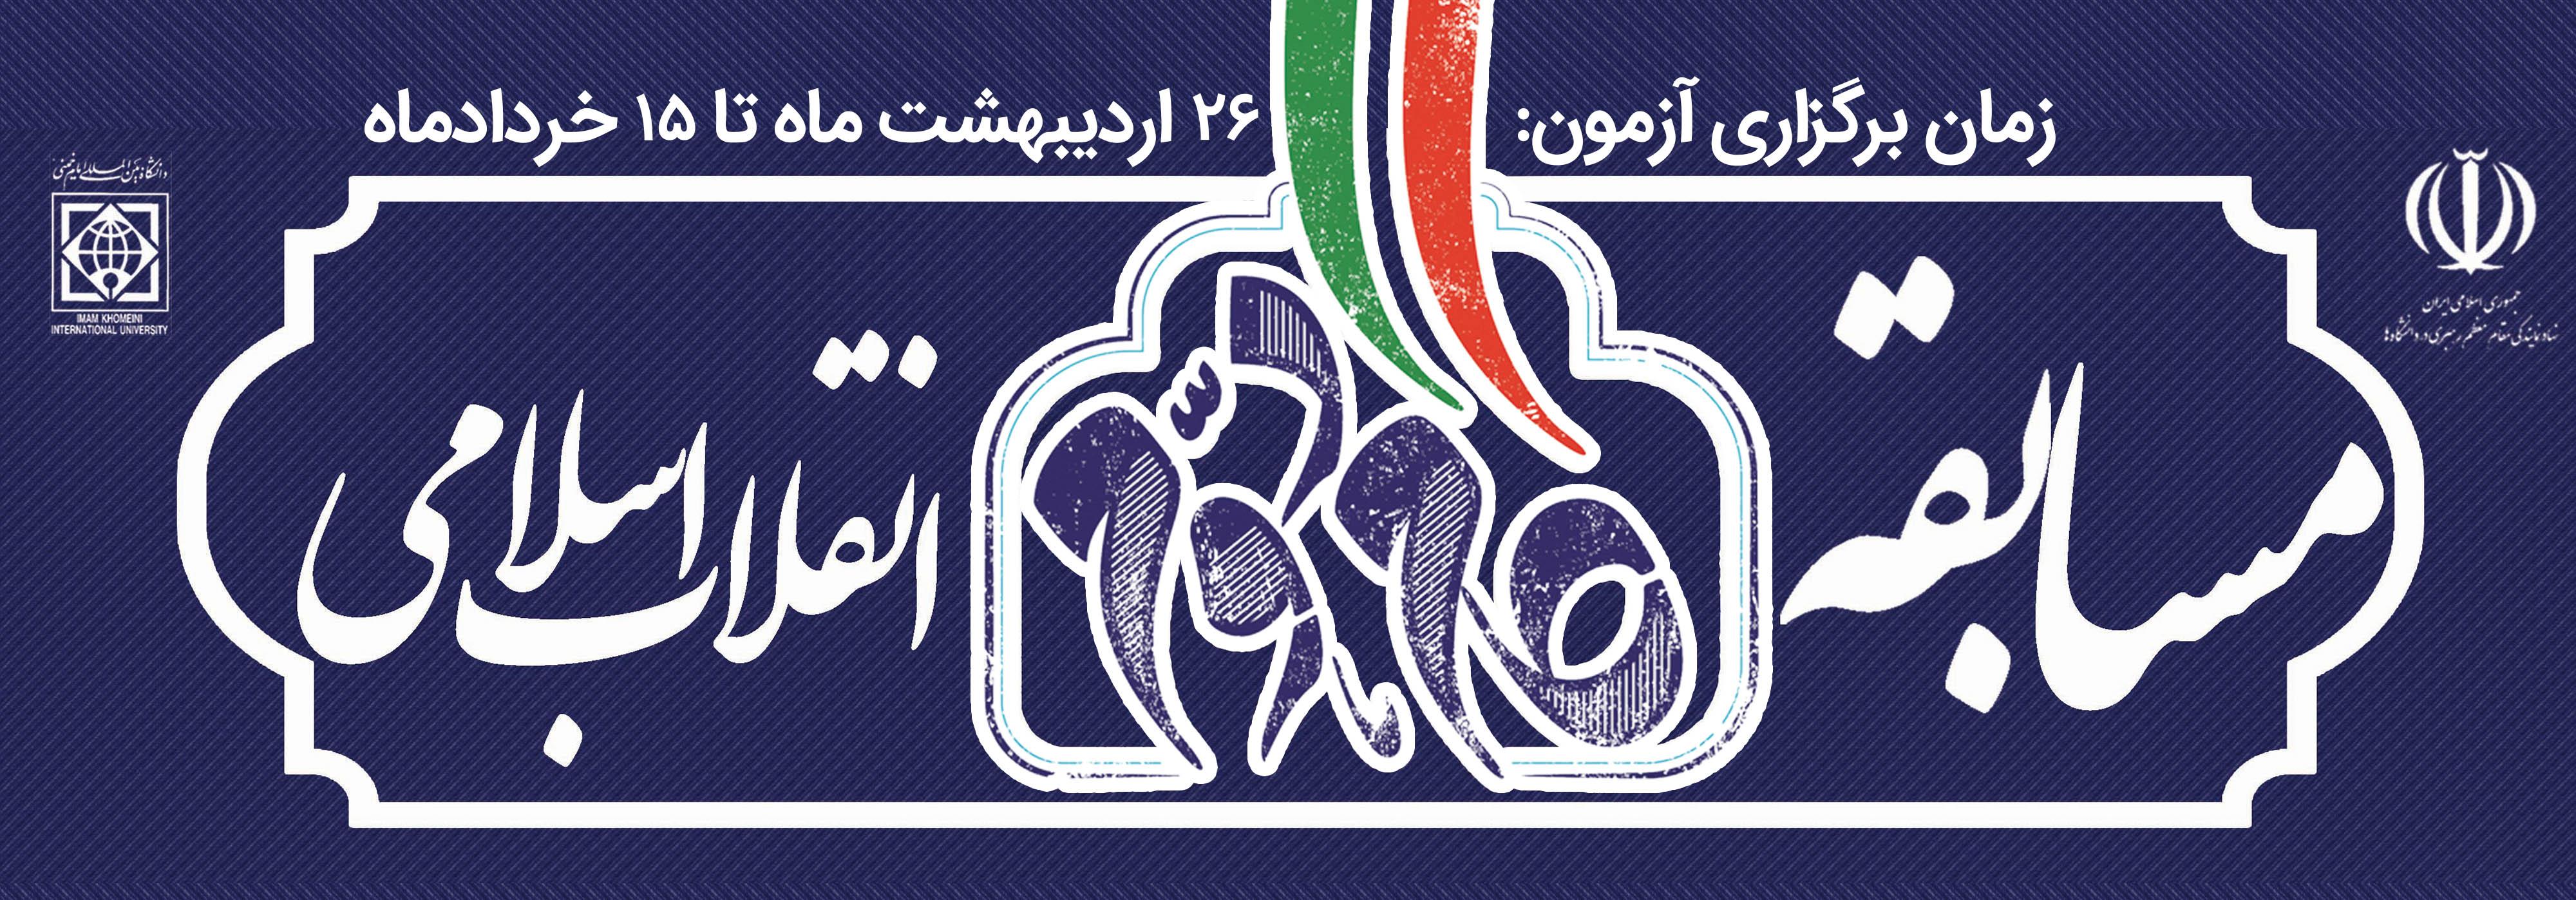 اعلام نتایج مسابقه بیانیه گام دوم انقلاب